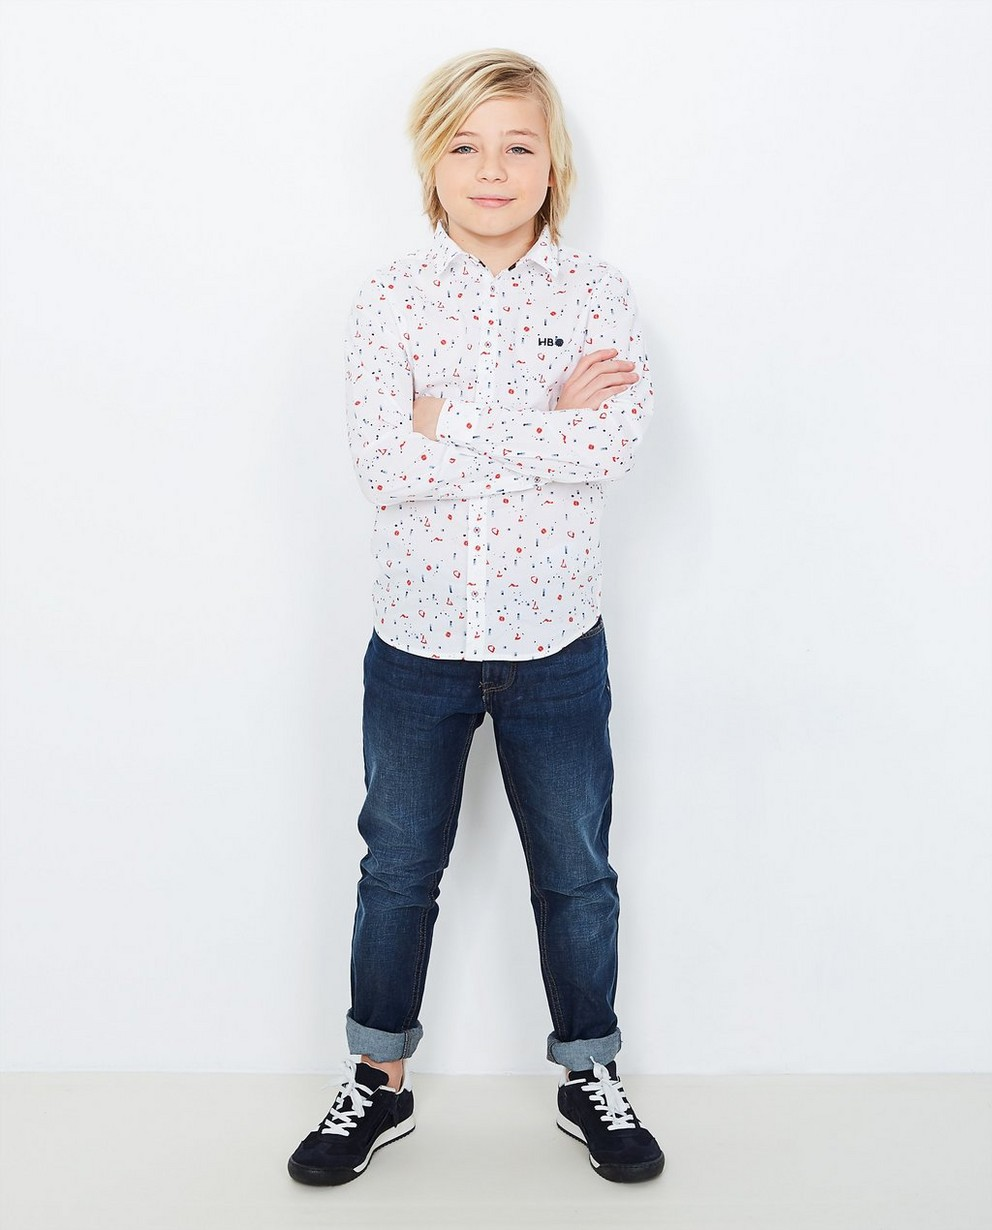 Jeans - navy - Donkerblauwe slim jeans